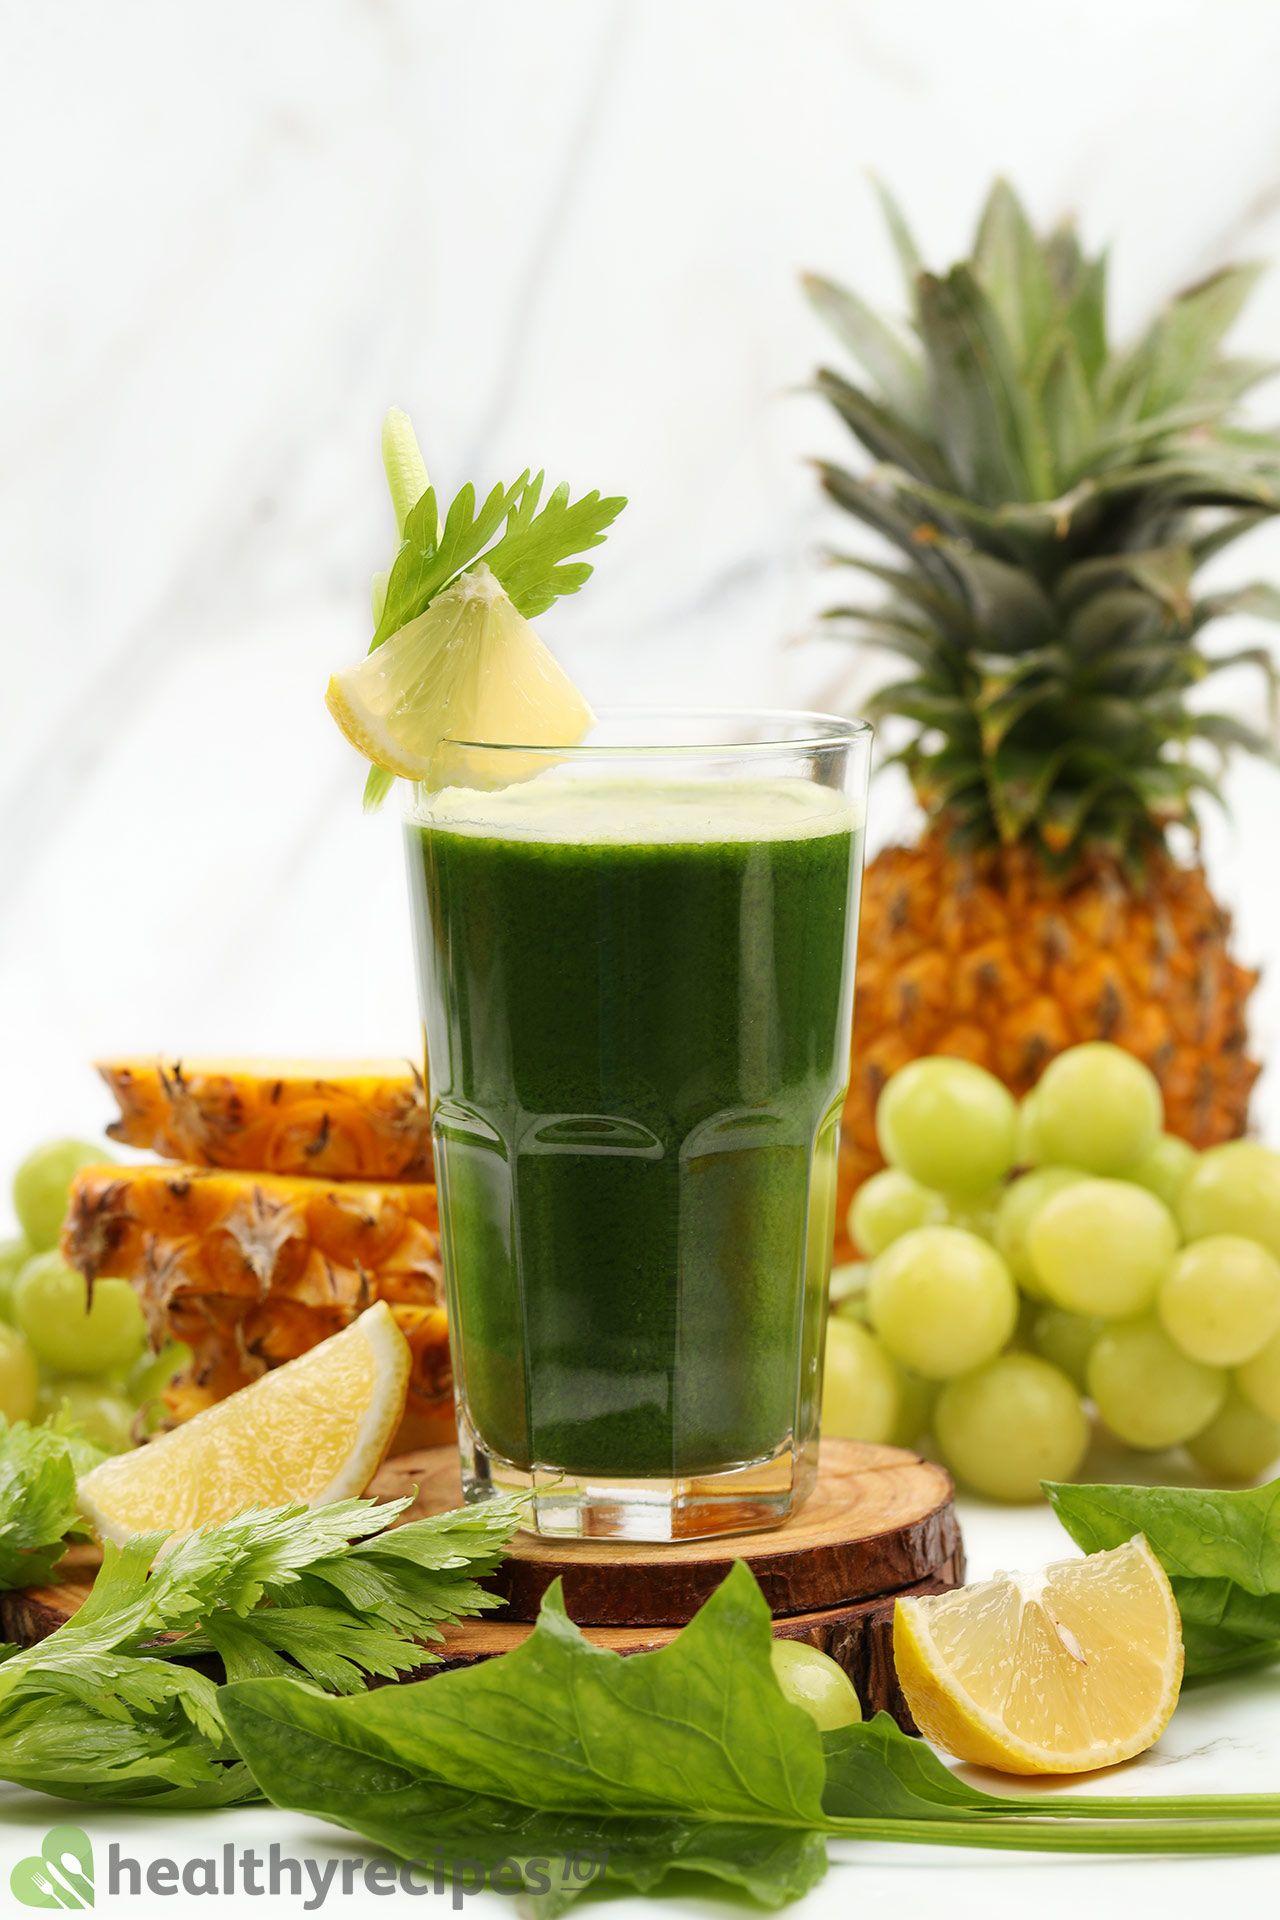 Homemade Spinach Juice Recipe